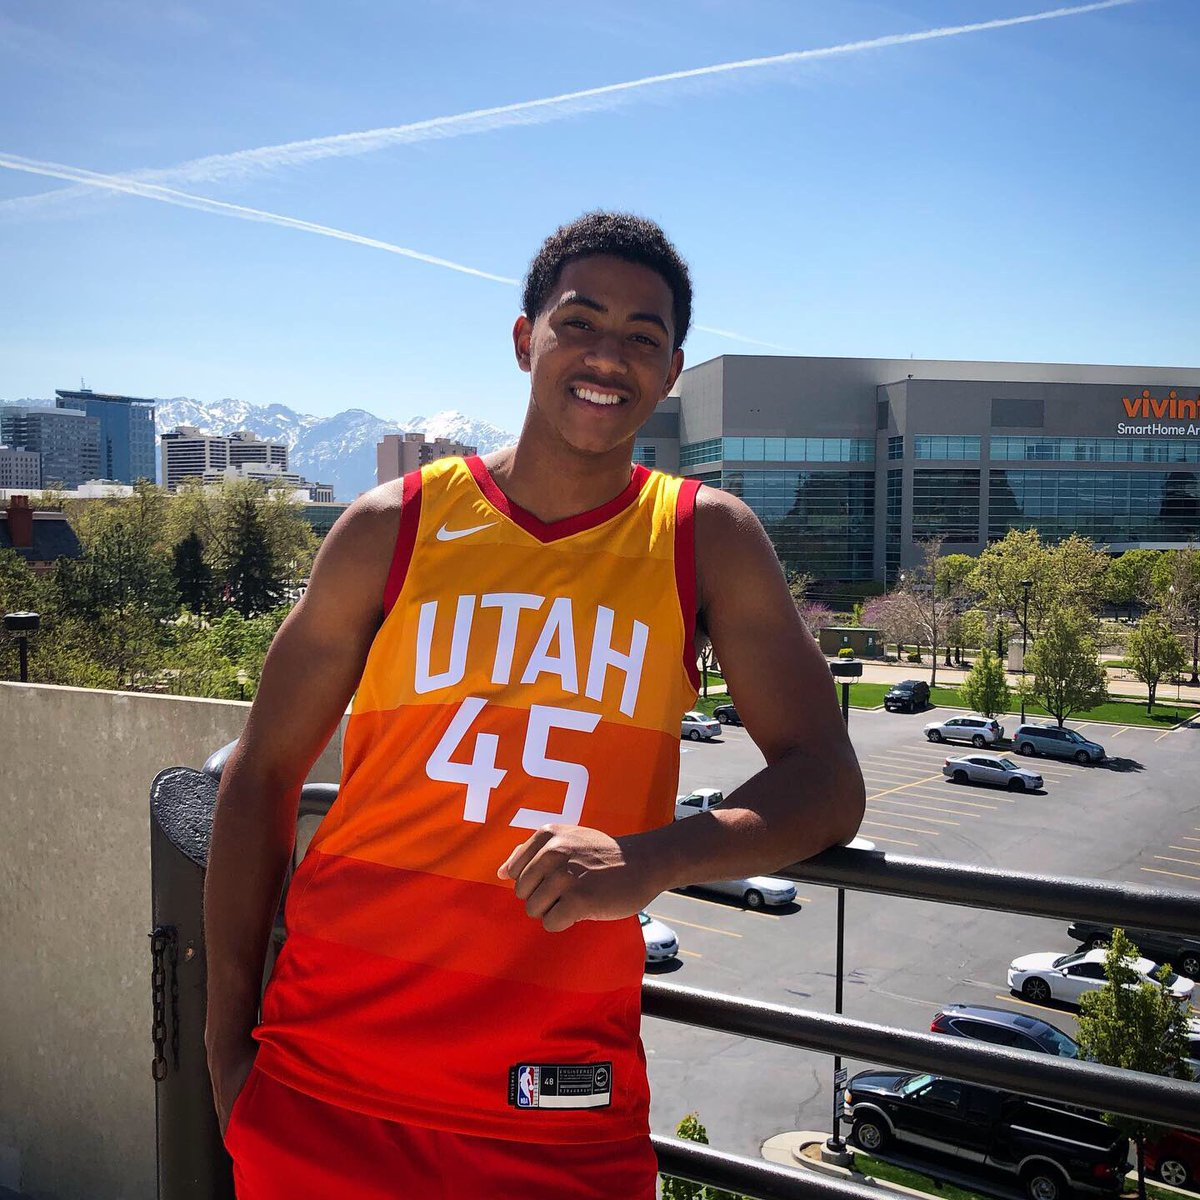 new arrivals 9a52b 72608 Utah Jazz Team Store on Twitter: